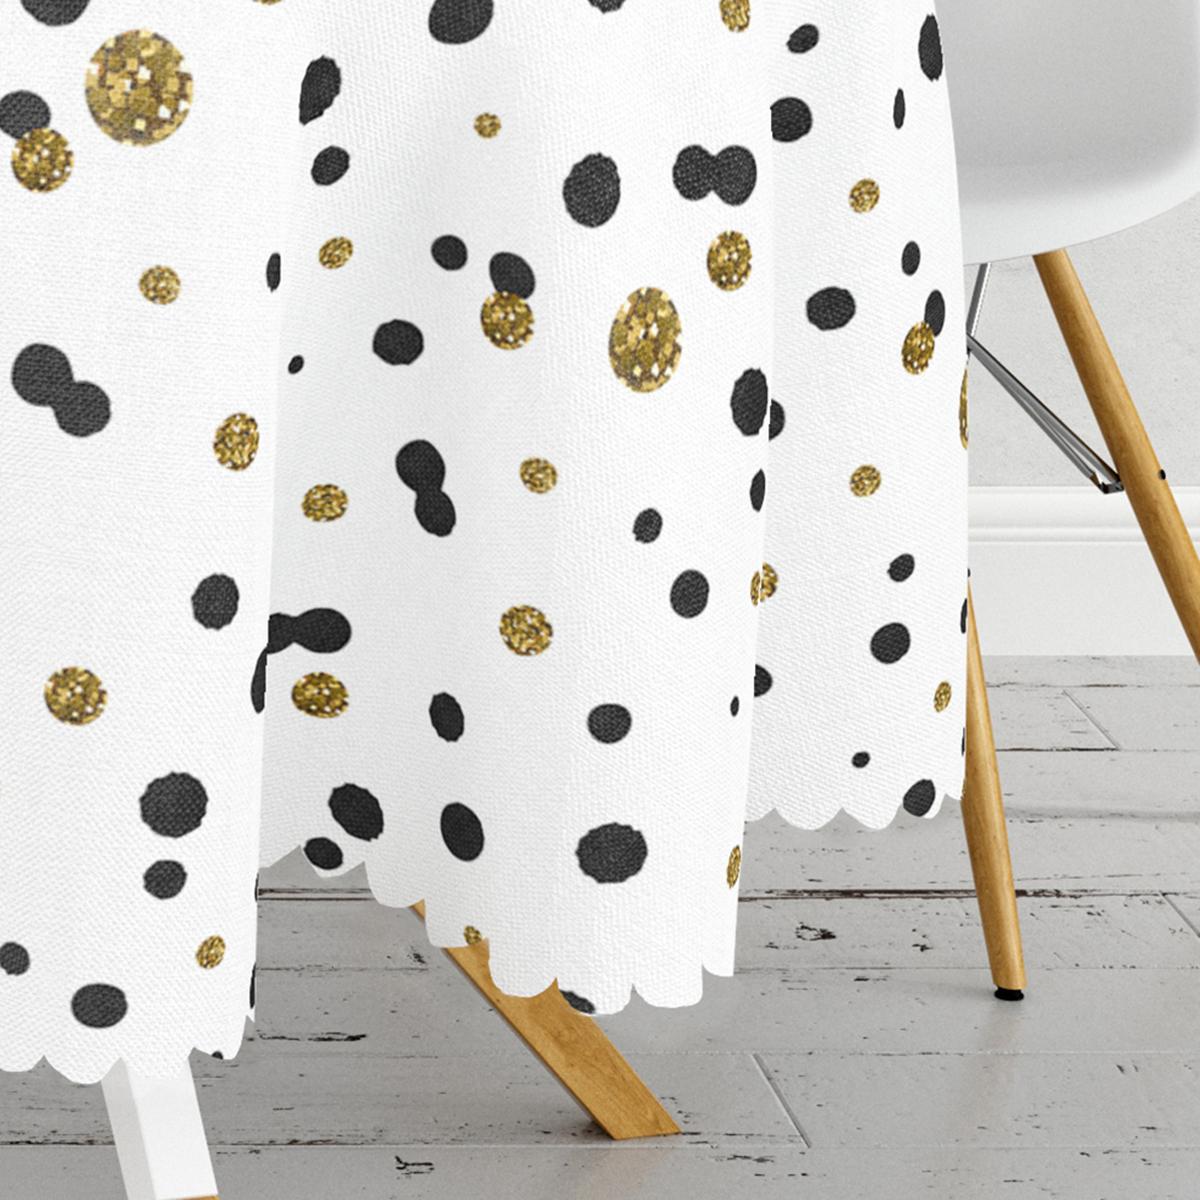 Beyaz Zeminde Gold Ve Siyah Renkli Pauntiyeler Modern Yuvarlak Masa Örtüsü - Çap 140cm Realhomes